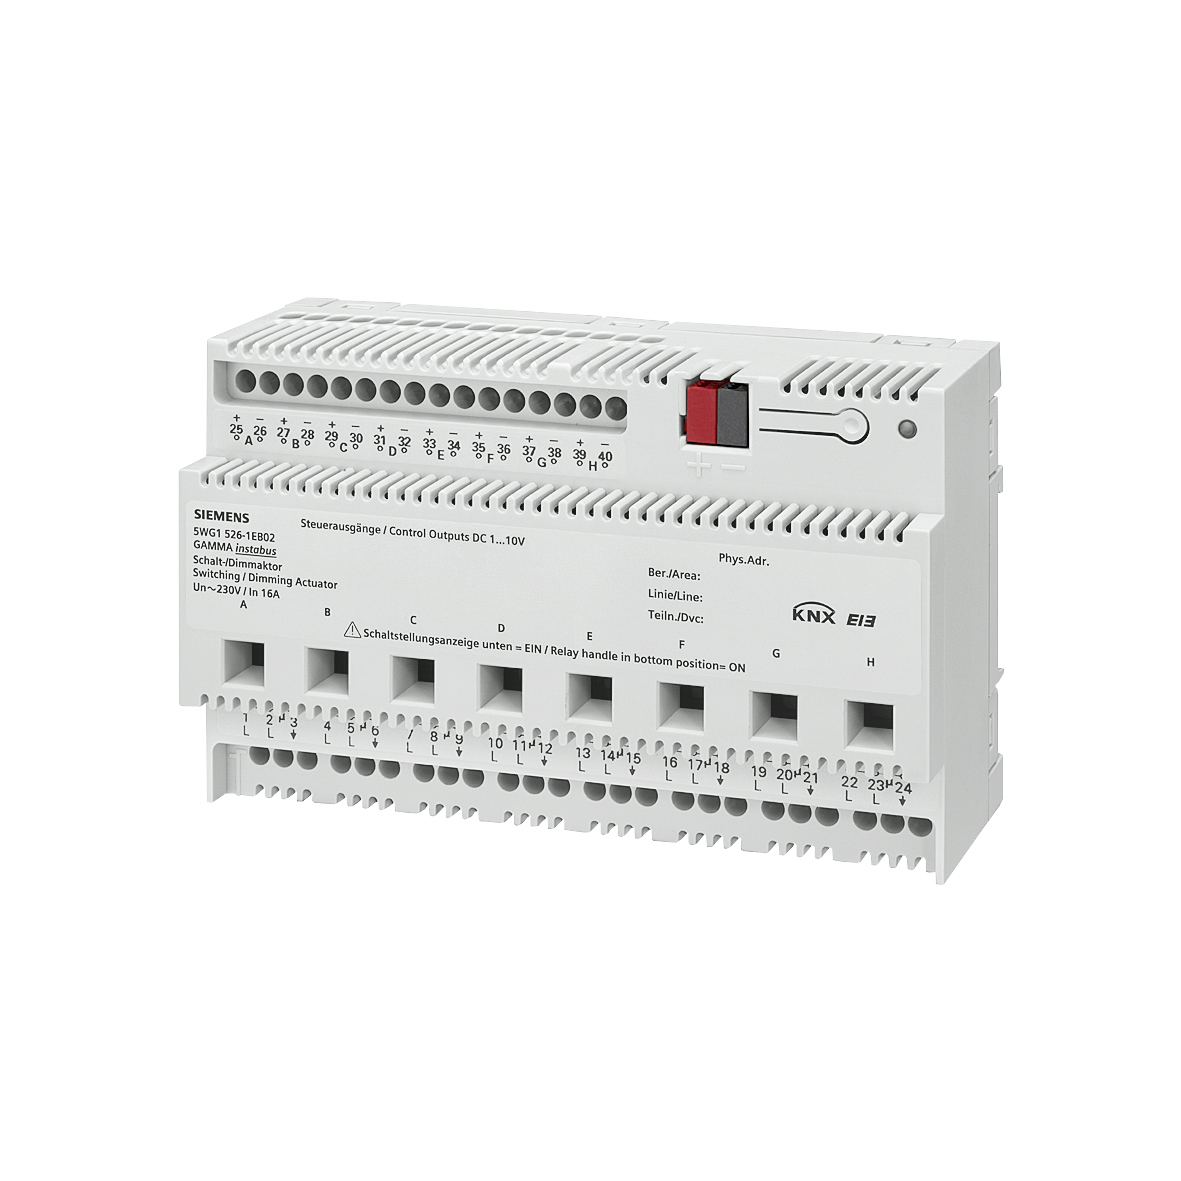 1 Stk Schalt-/Dimmaktor, 8 x AC 230 V, 16 A, 1 ... 10 V KX5261EB02